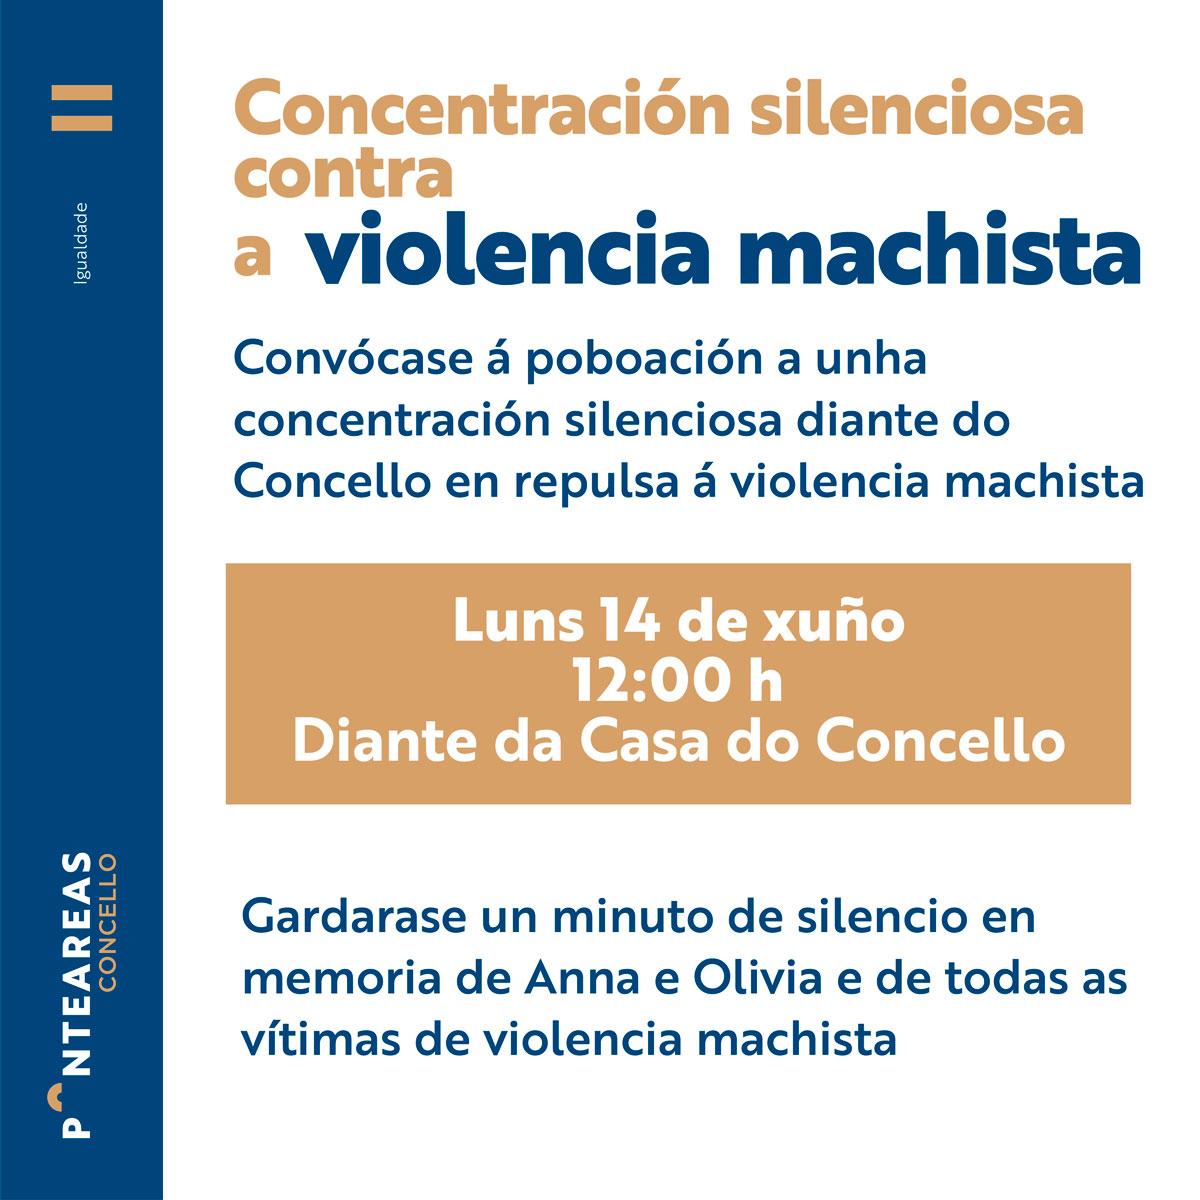 Concentración silenciosa contra a violencia machista